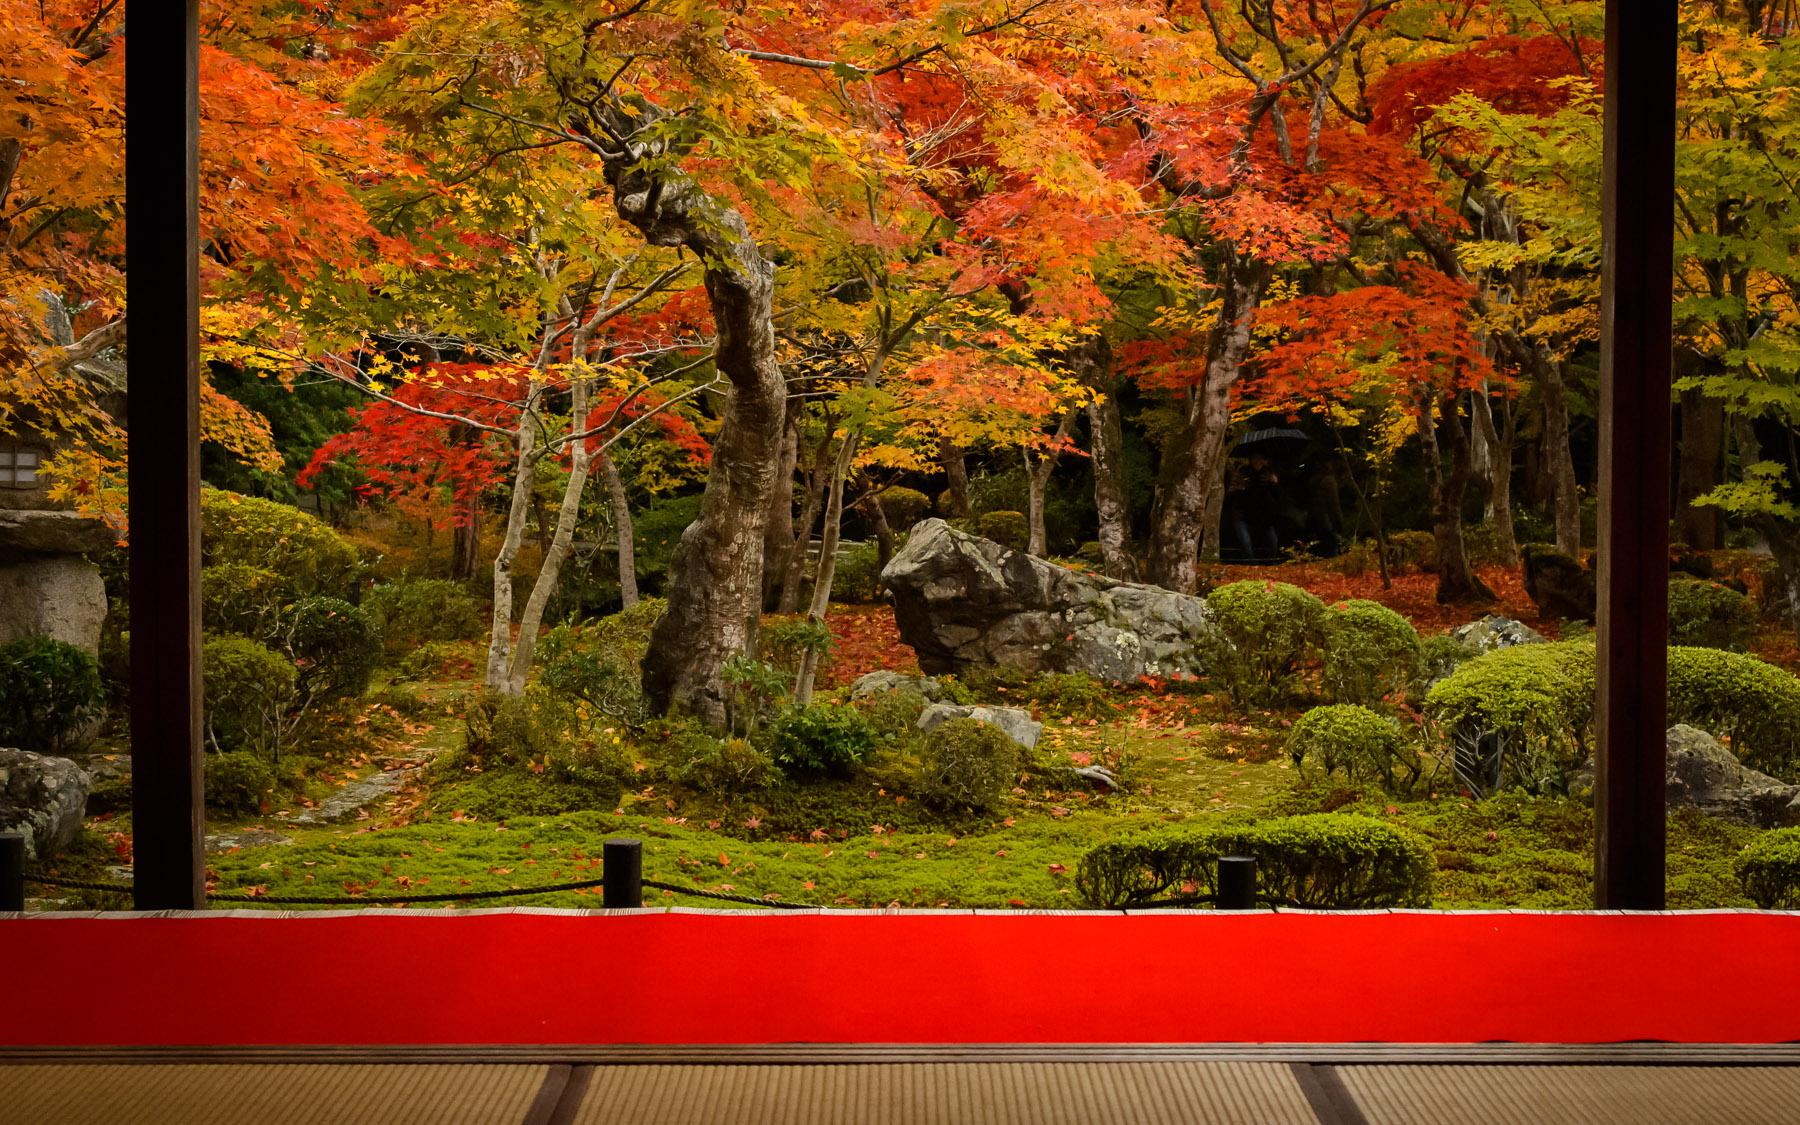 Fall Colors Desktop Wallpaper Jeffrey Friedl S Blog 187 Impossible Shot At Kyoto S Enkoji